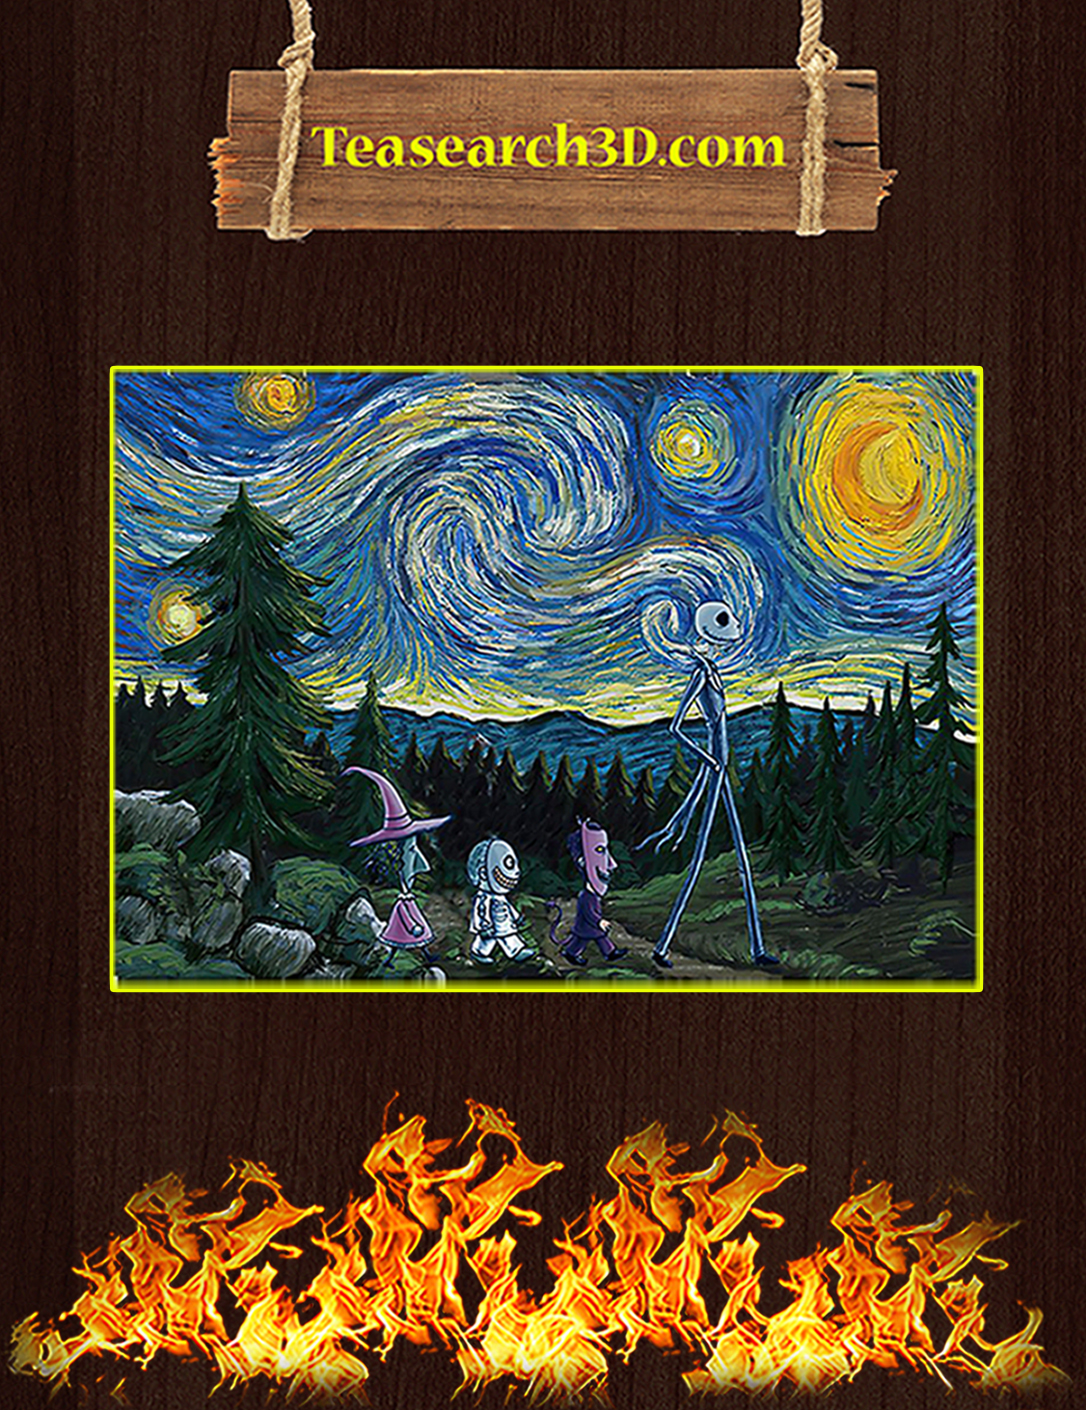 Jack skellington starry nightmare poster A2